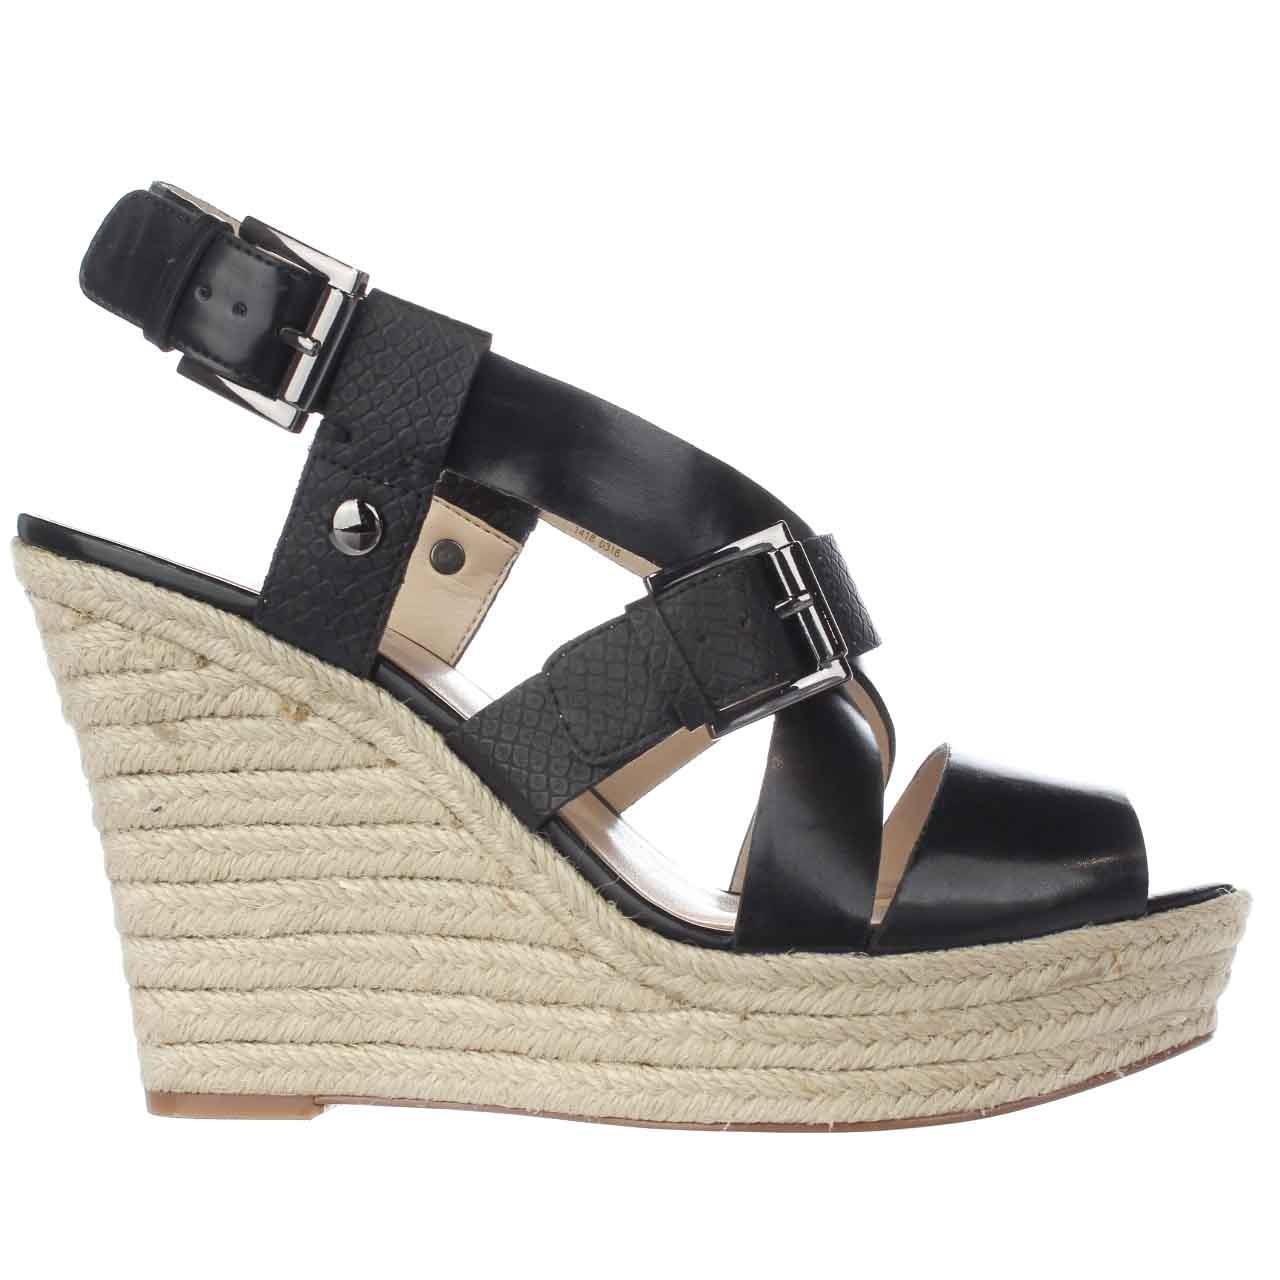 Lyst Nine West Jentri Wedge Sandals In Black